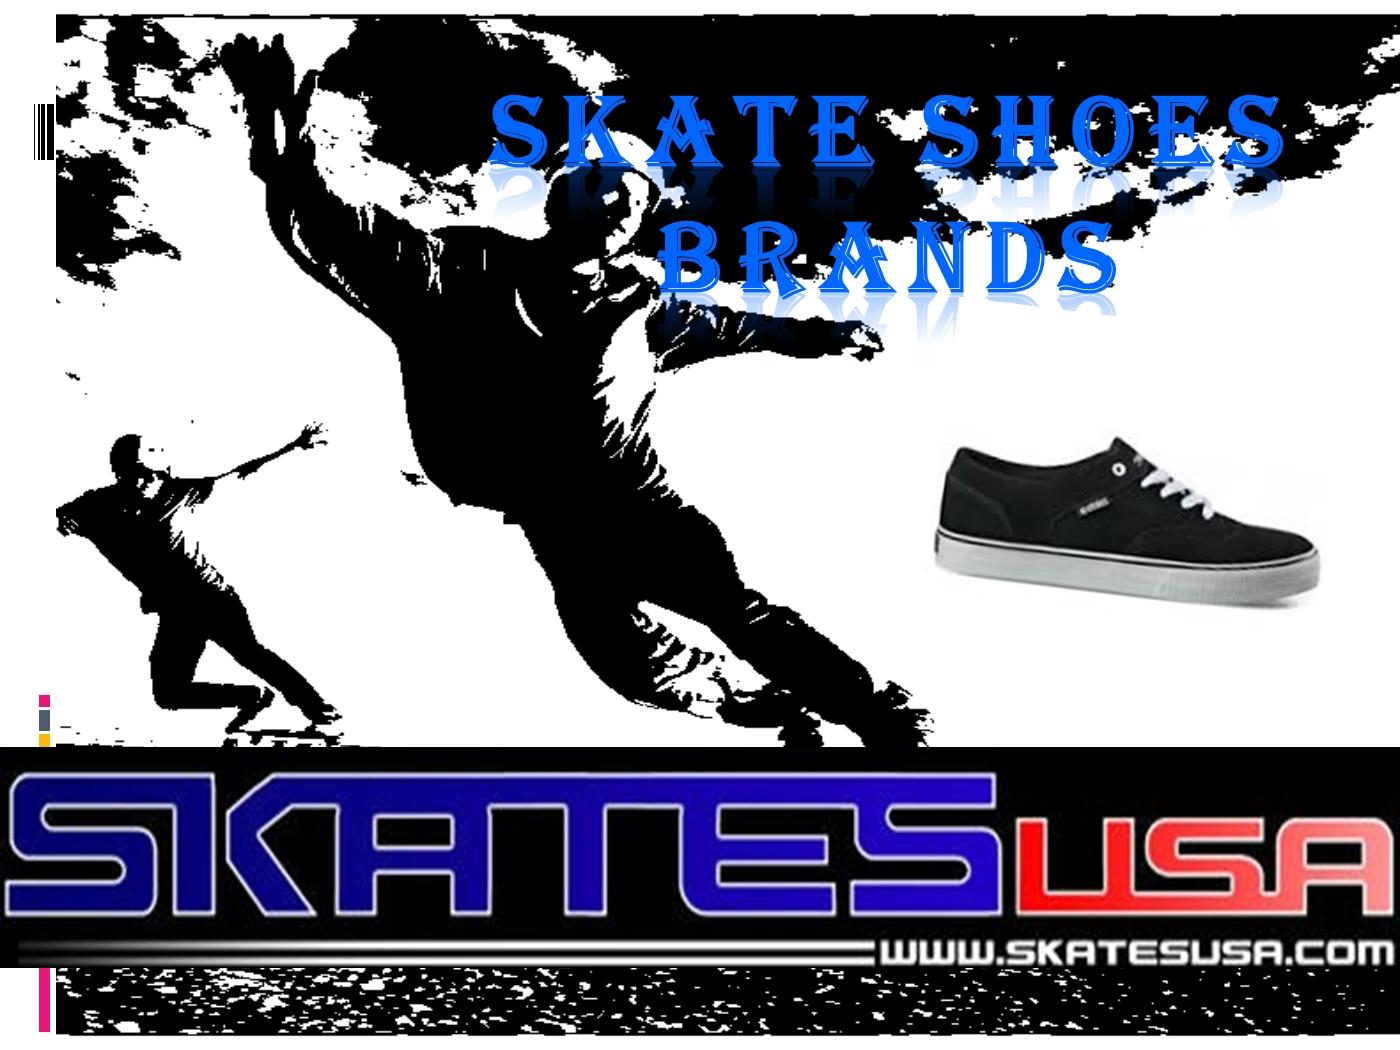 Skates shoes brands PowerPoint Presentation PPT